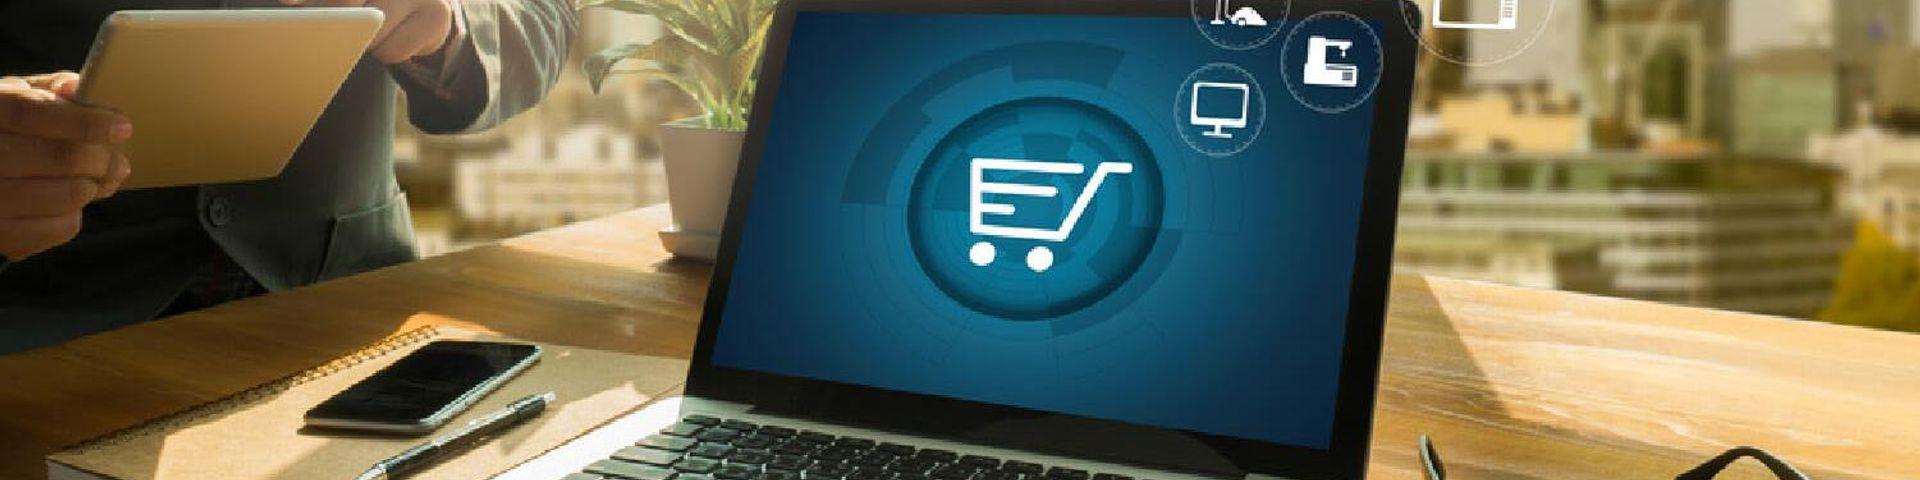 E-Commerce y Marketing Online